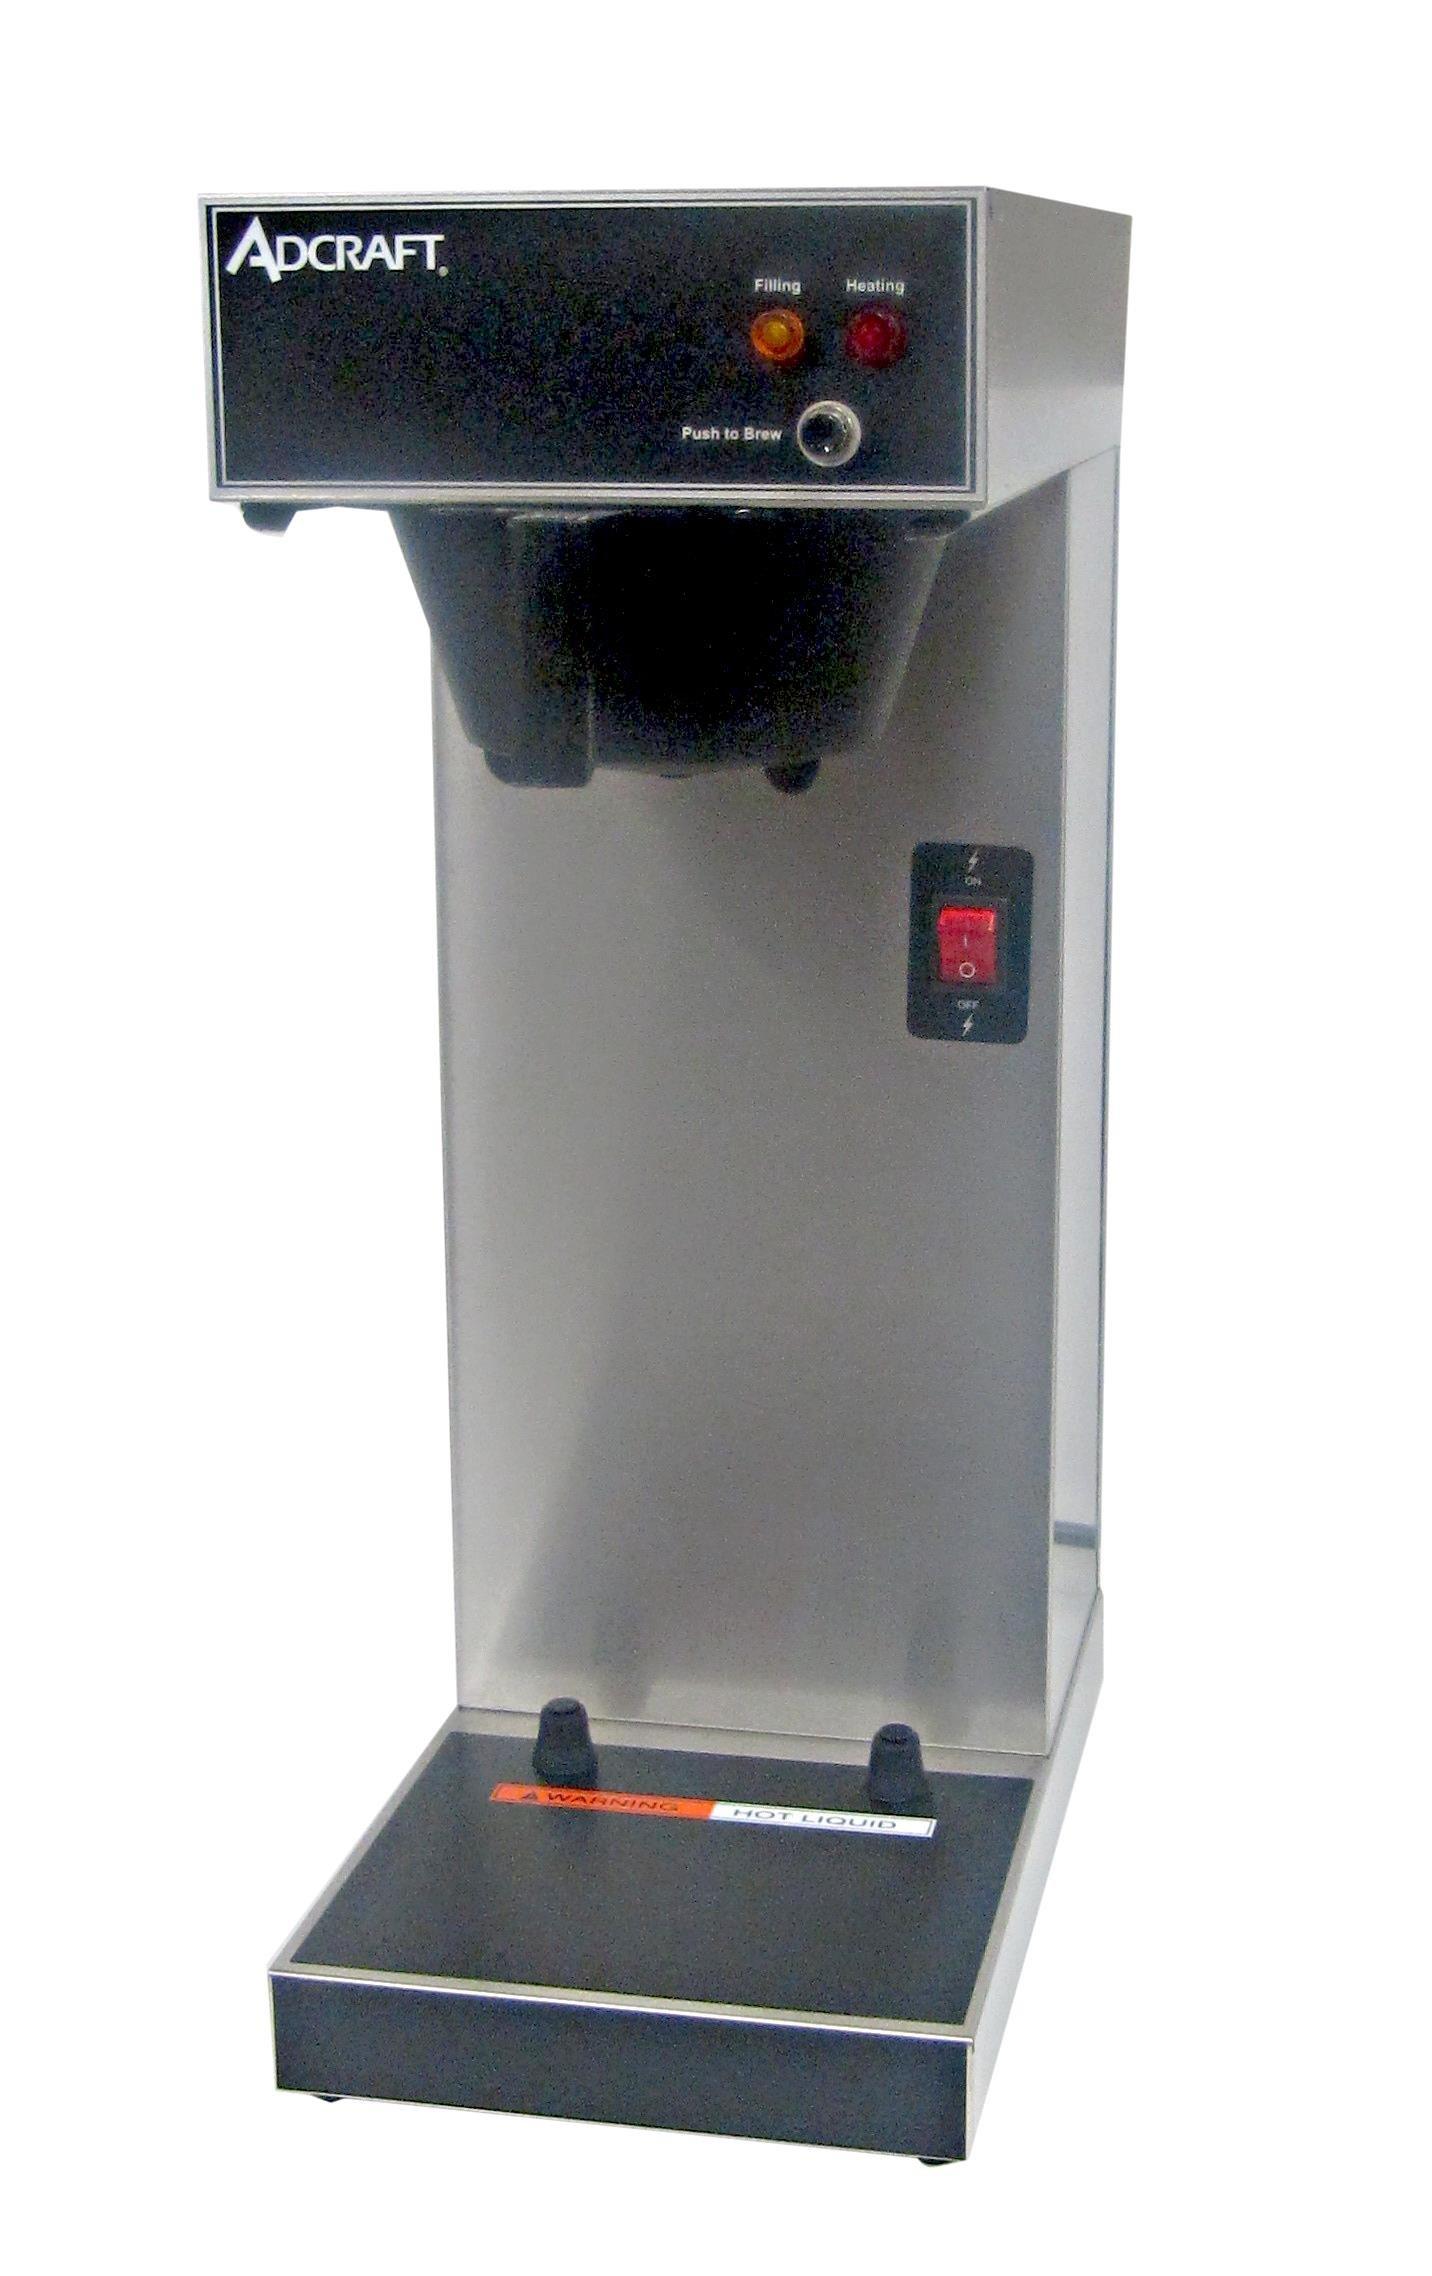 Adcraft UB-289 Airpot Coffee Brewer, Stainless Steel, 120-Volt